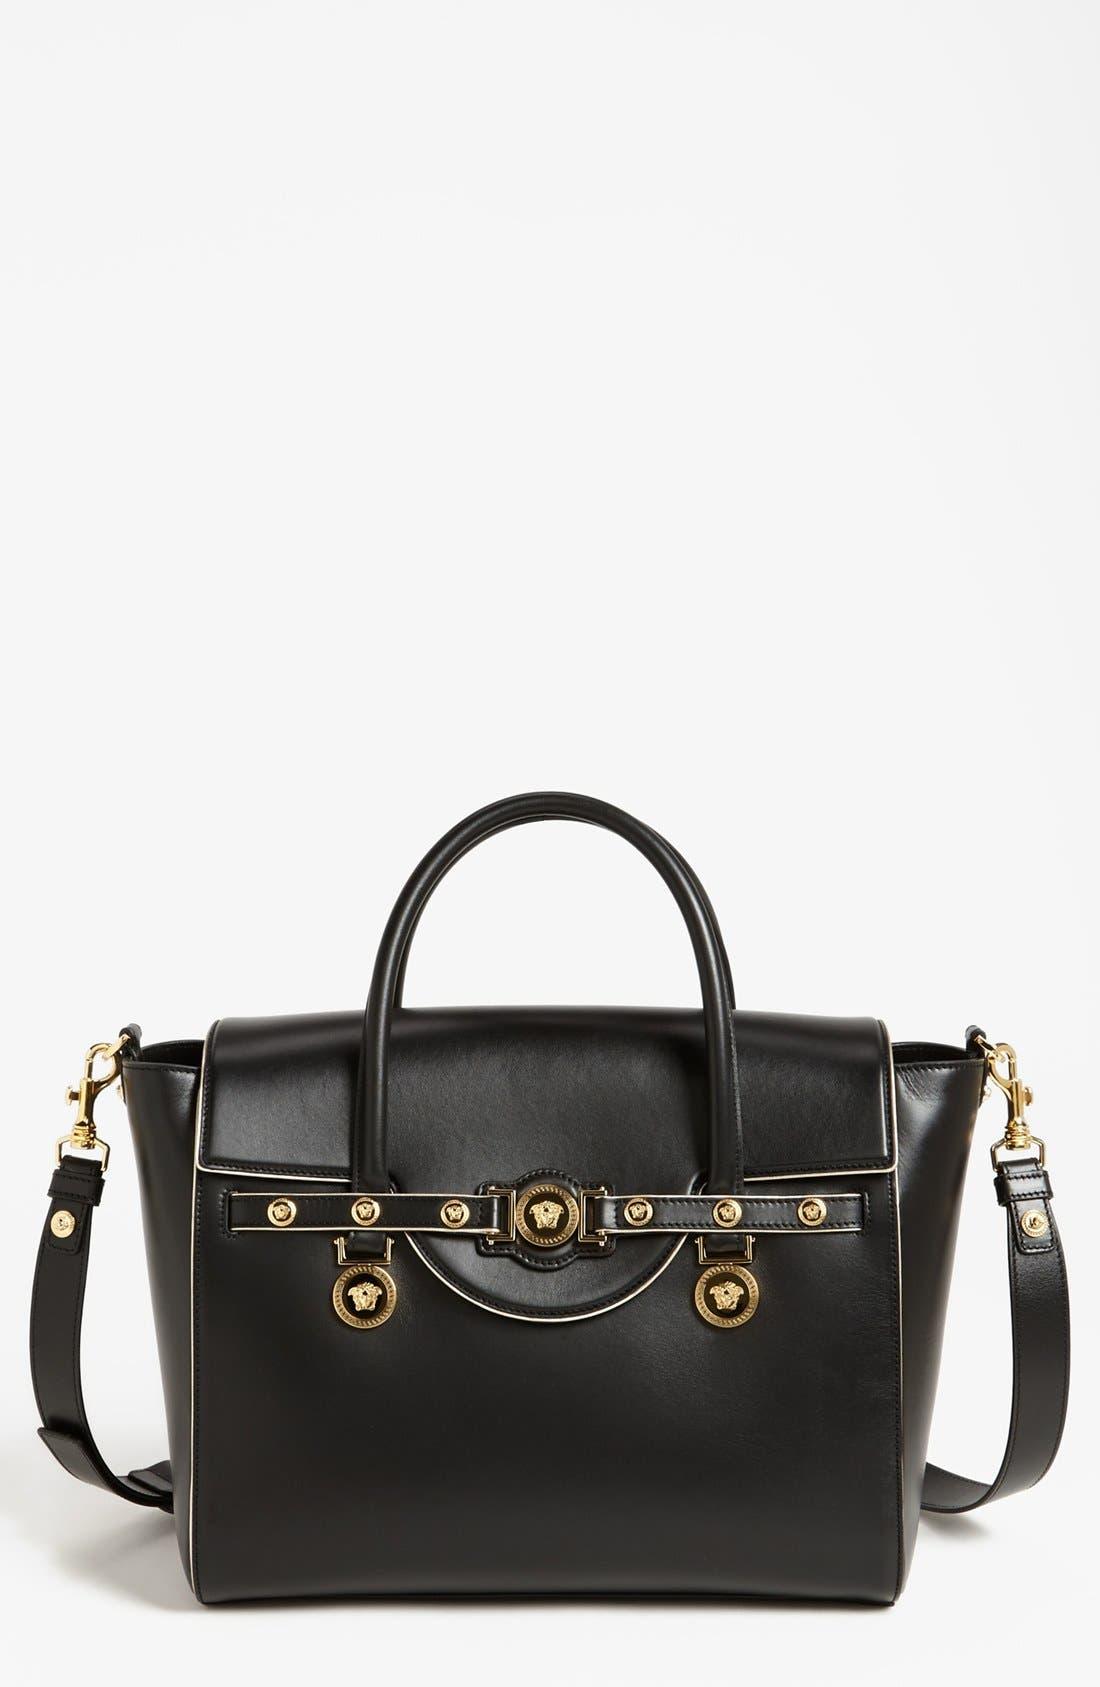 Alternate Image 1 Selected - Versace Top Handle Leather Satchel